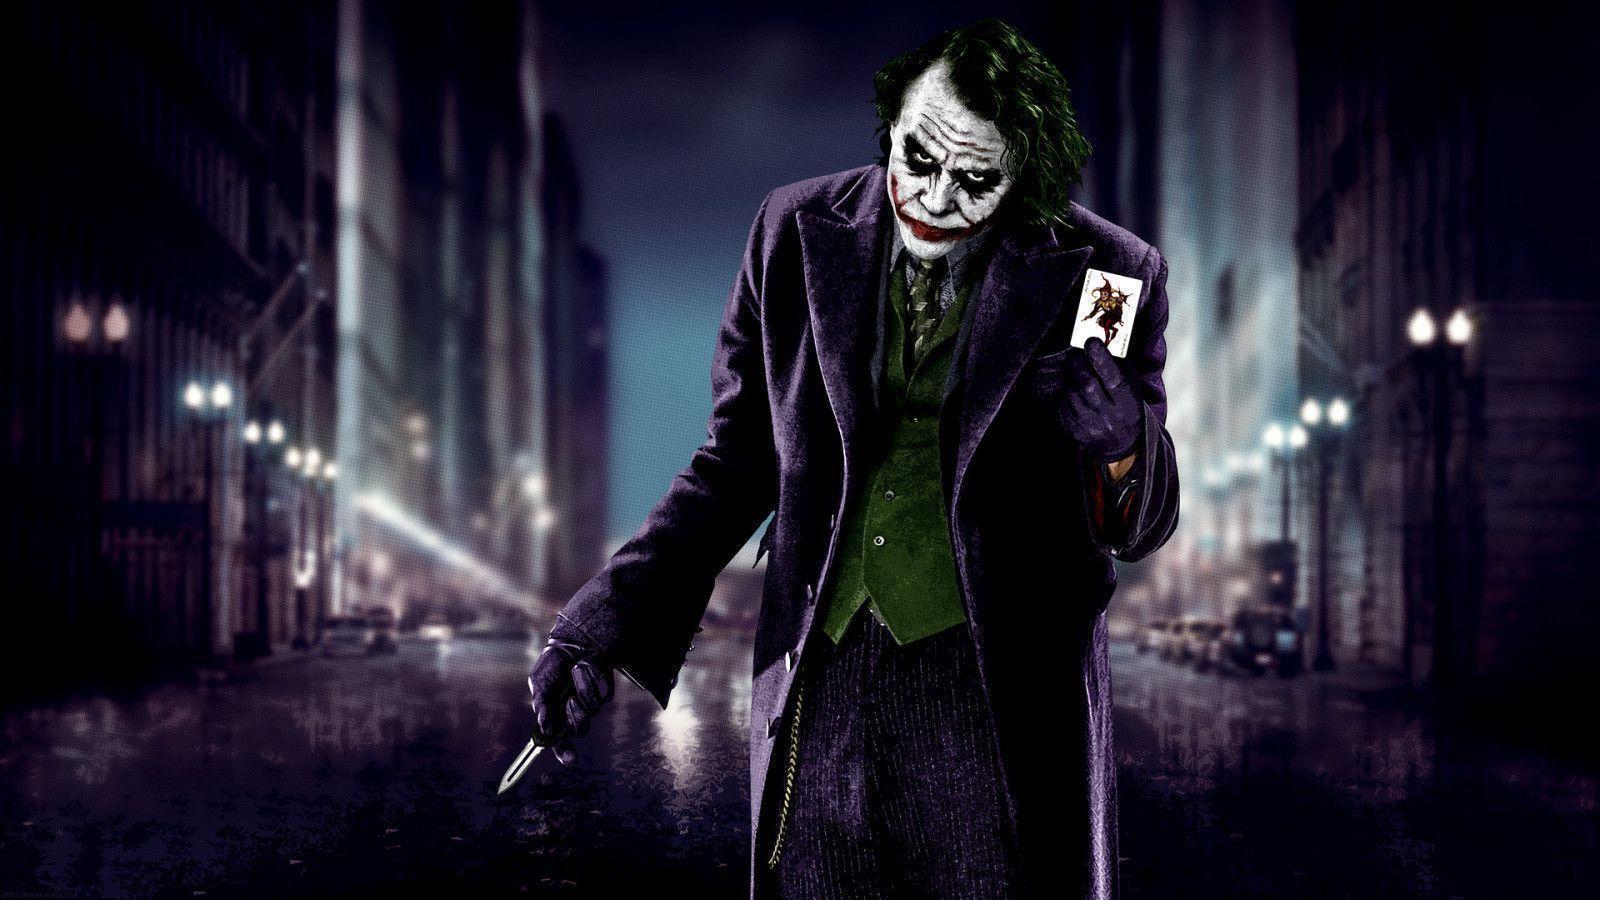 The Dark Knight Joker Wallpapers 1600x900